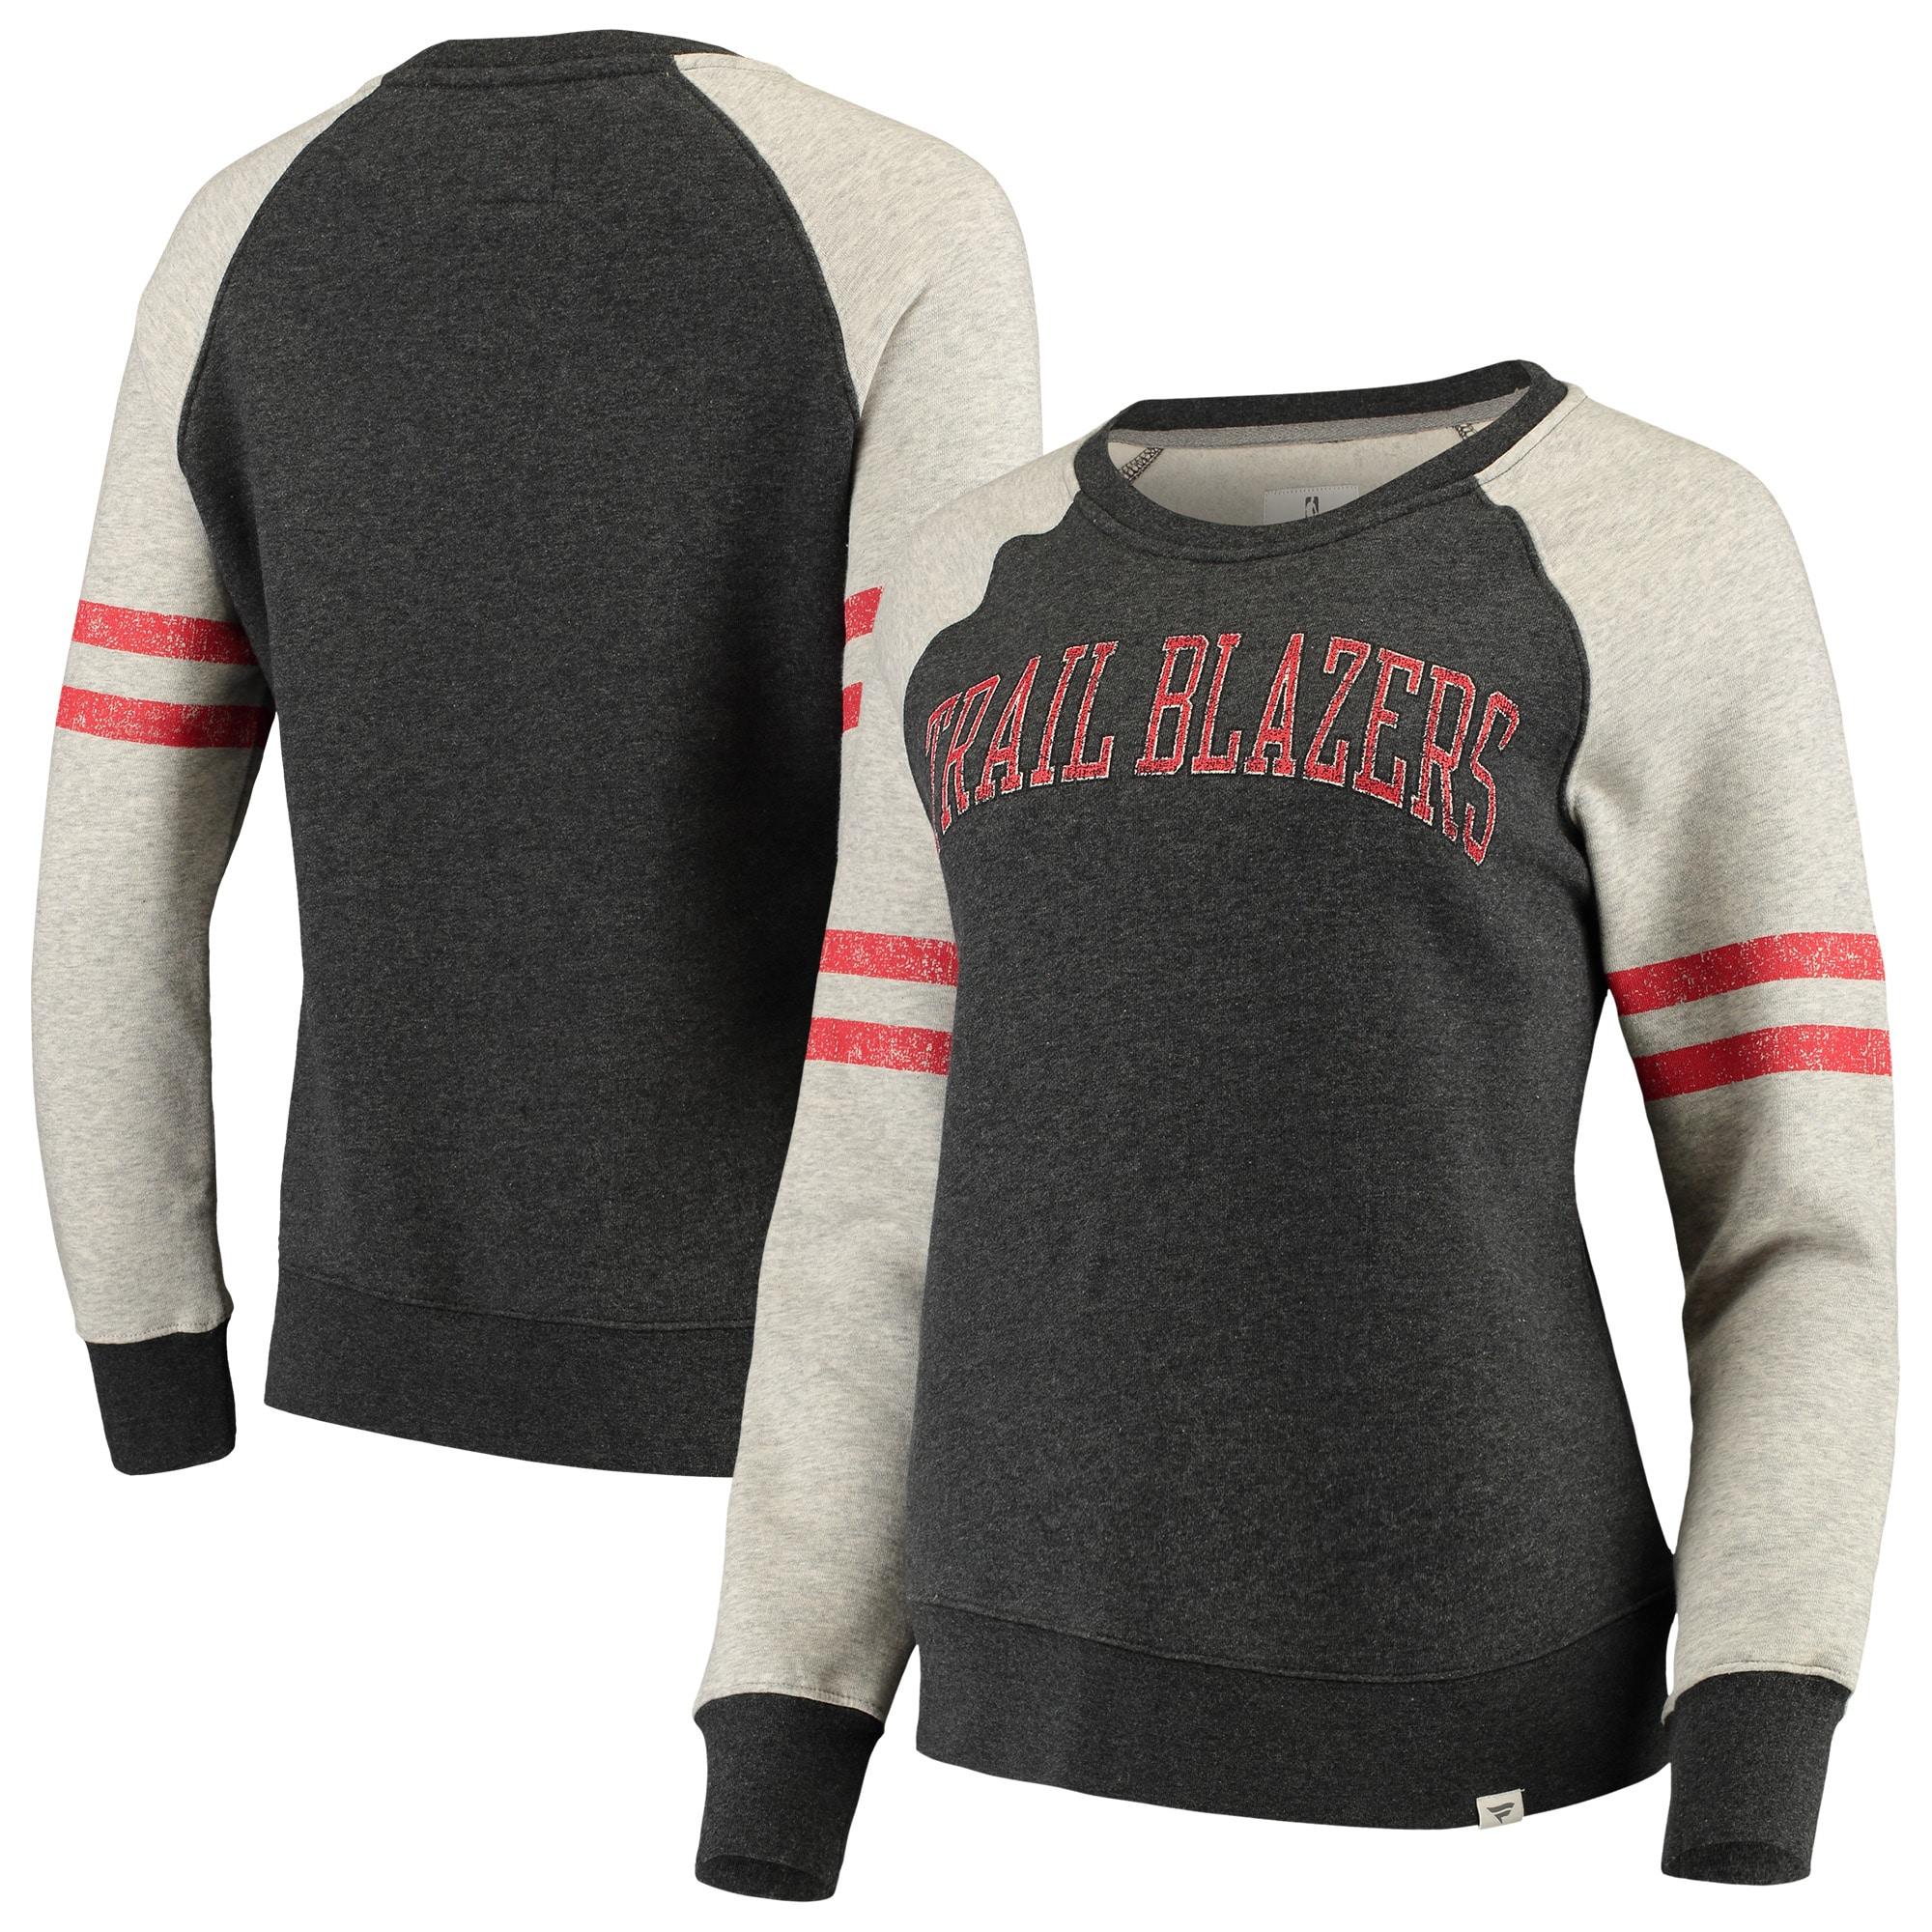 Portland Trail Blazers Fanatics Branded Women's True Classics Fleece Pullover Sweatshirt - Heathered Gray